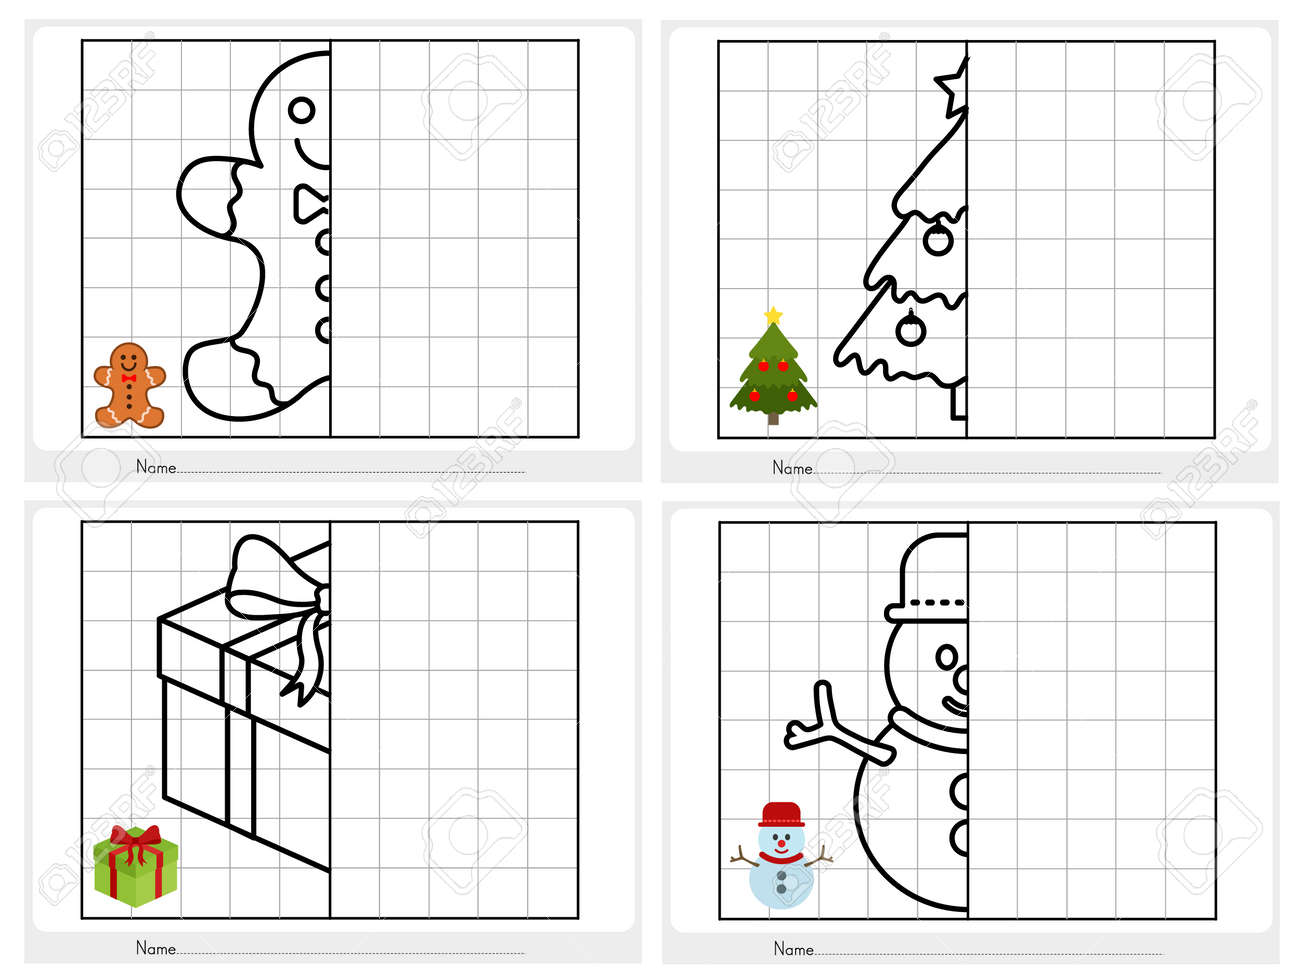 Christmas theme activity sheet - Symmetrical picture - Worksheet..